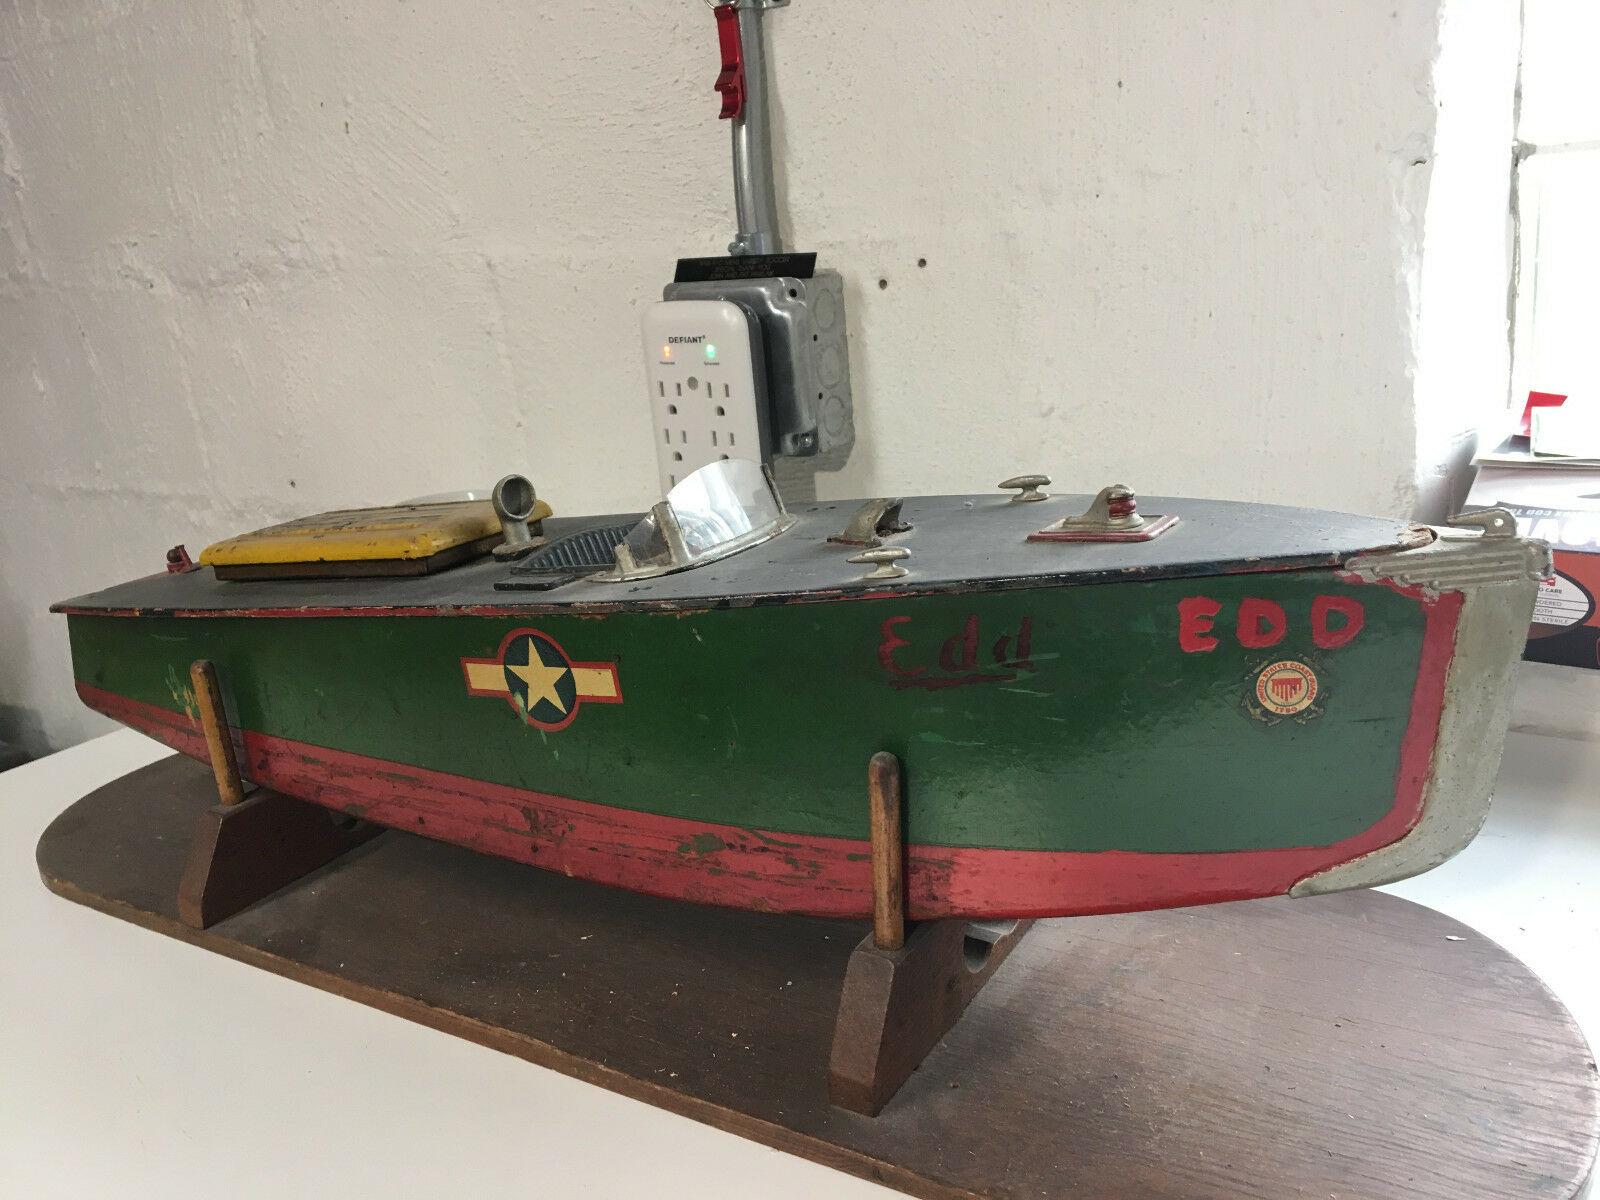 vintage-orkin-toy-boat-model-army-_57.jpg